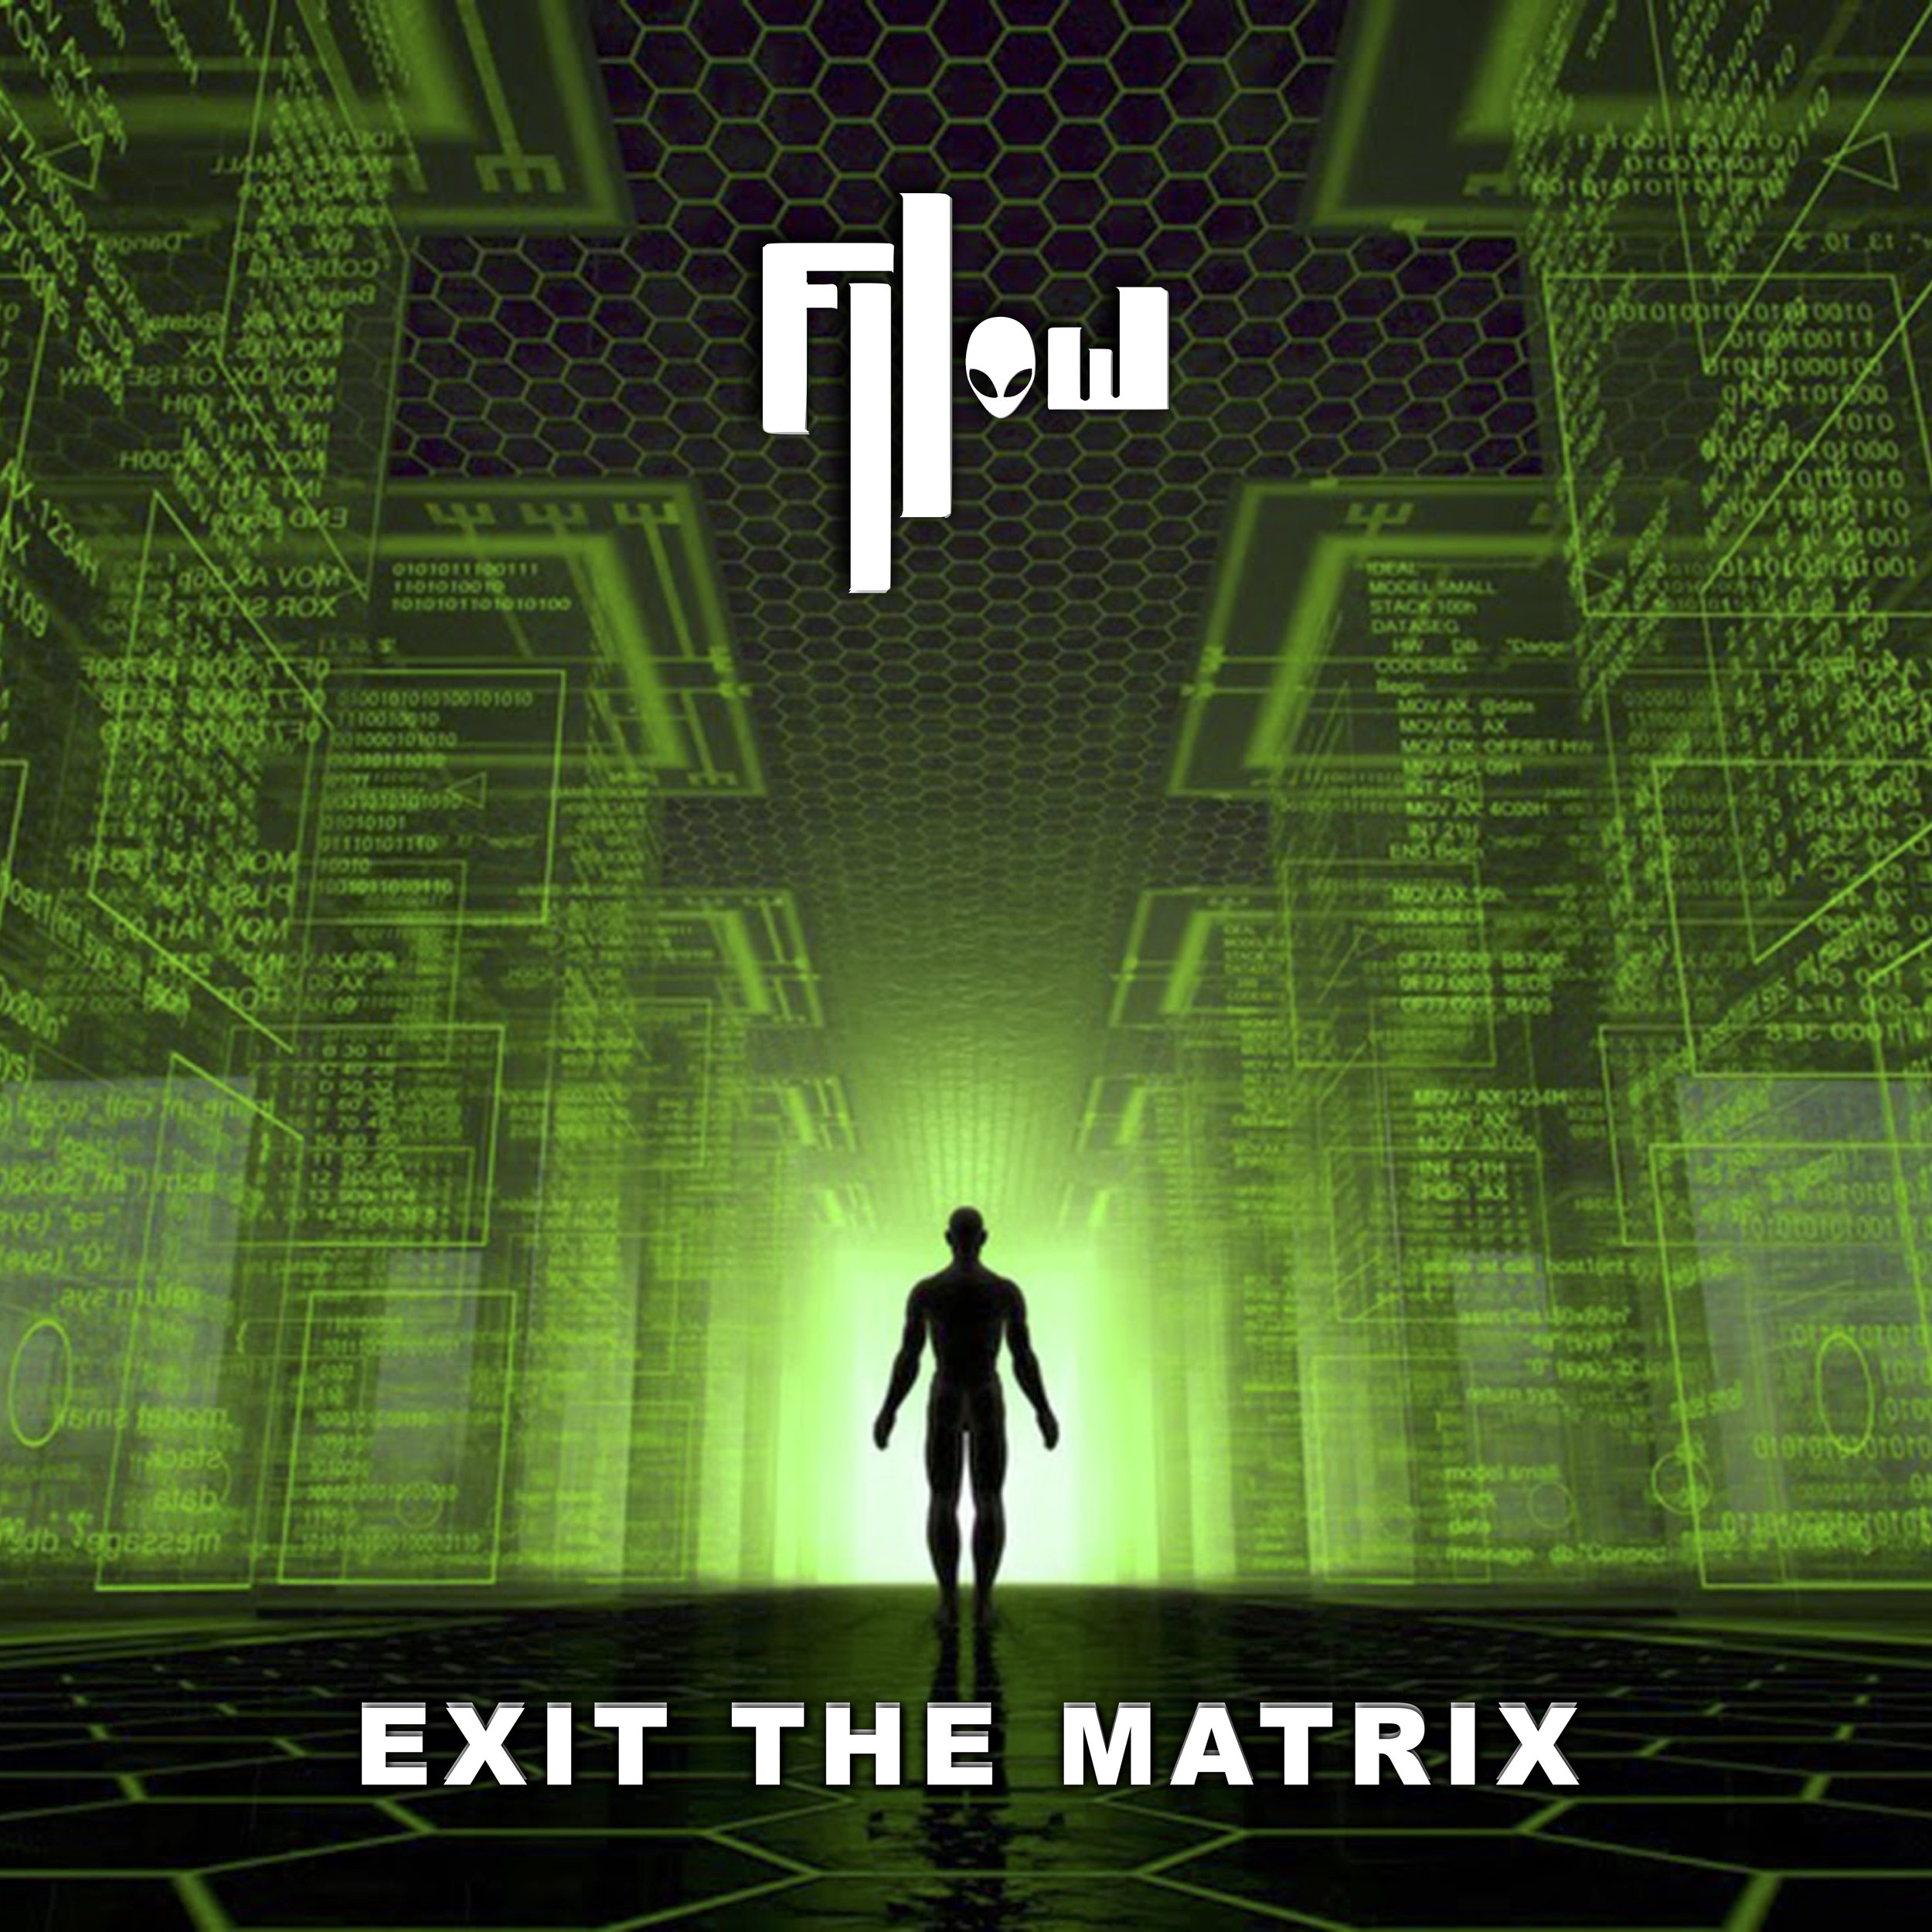 EXIT TH MATRIX ALBUM COVER FLLOW.jpg